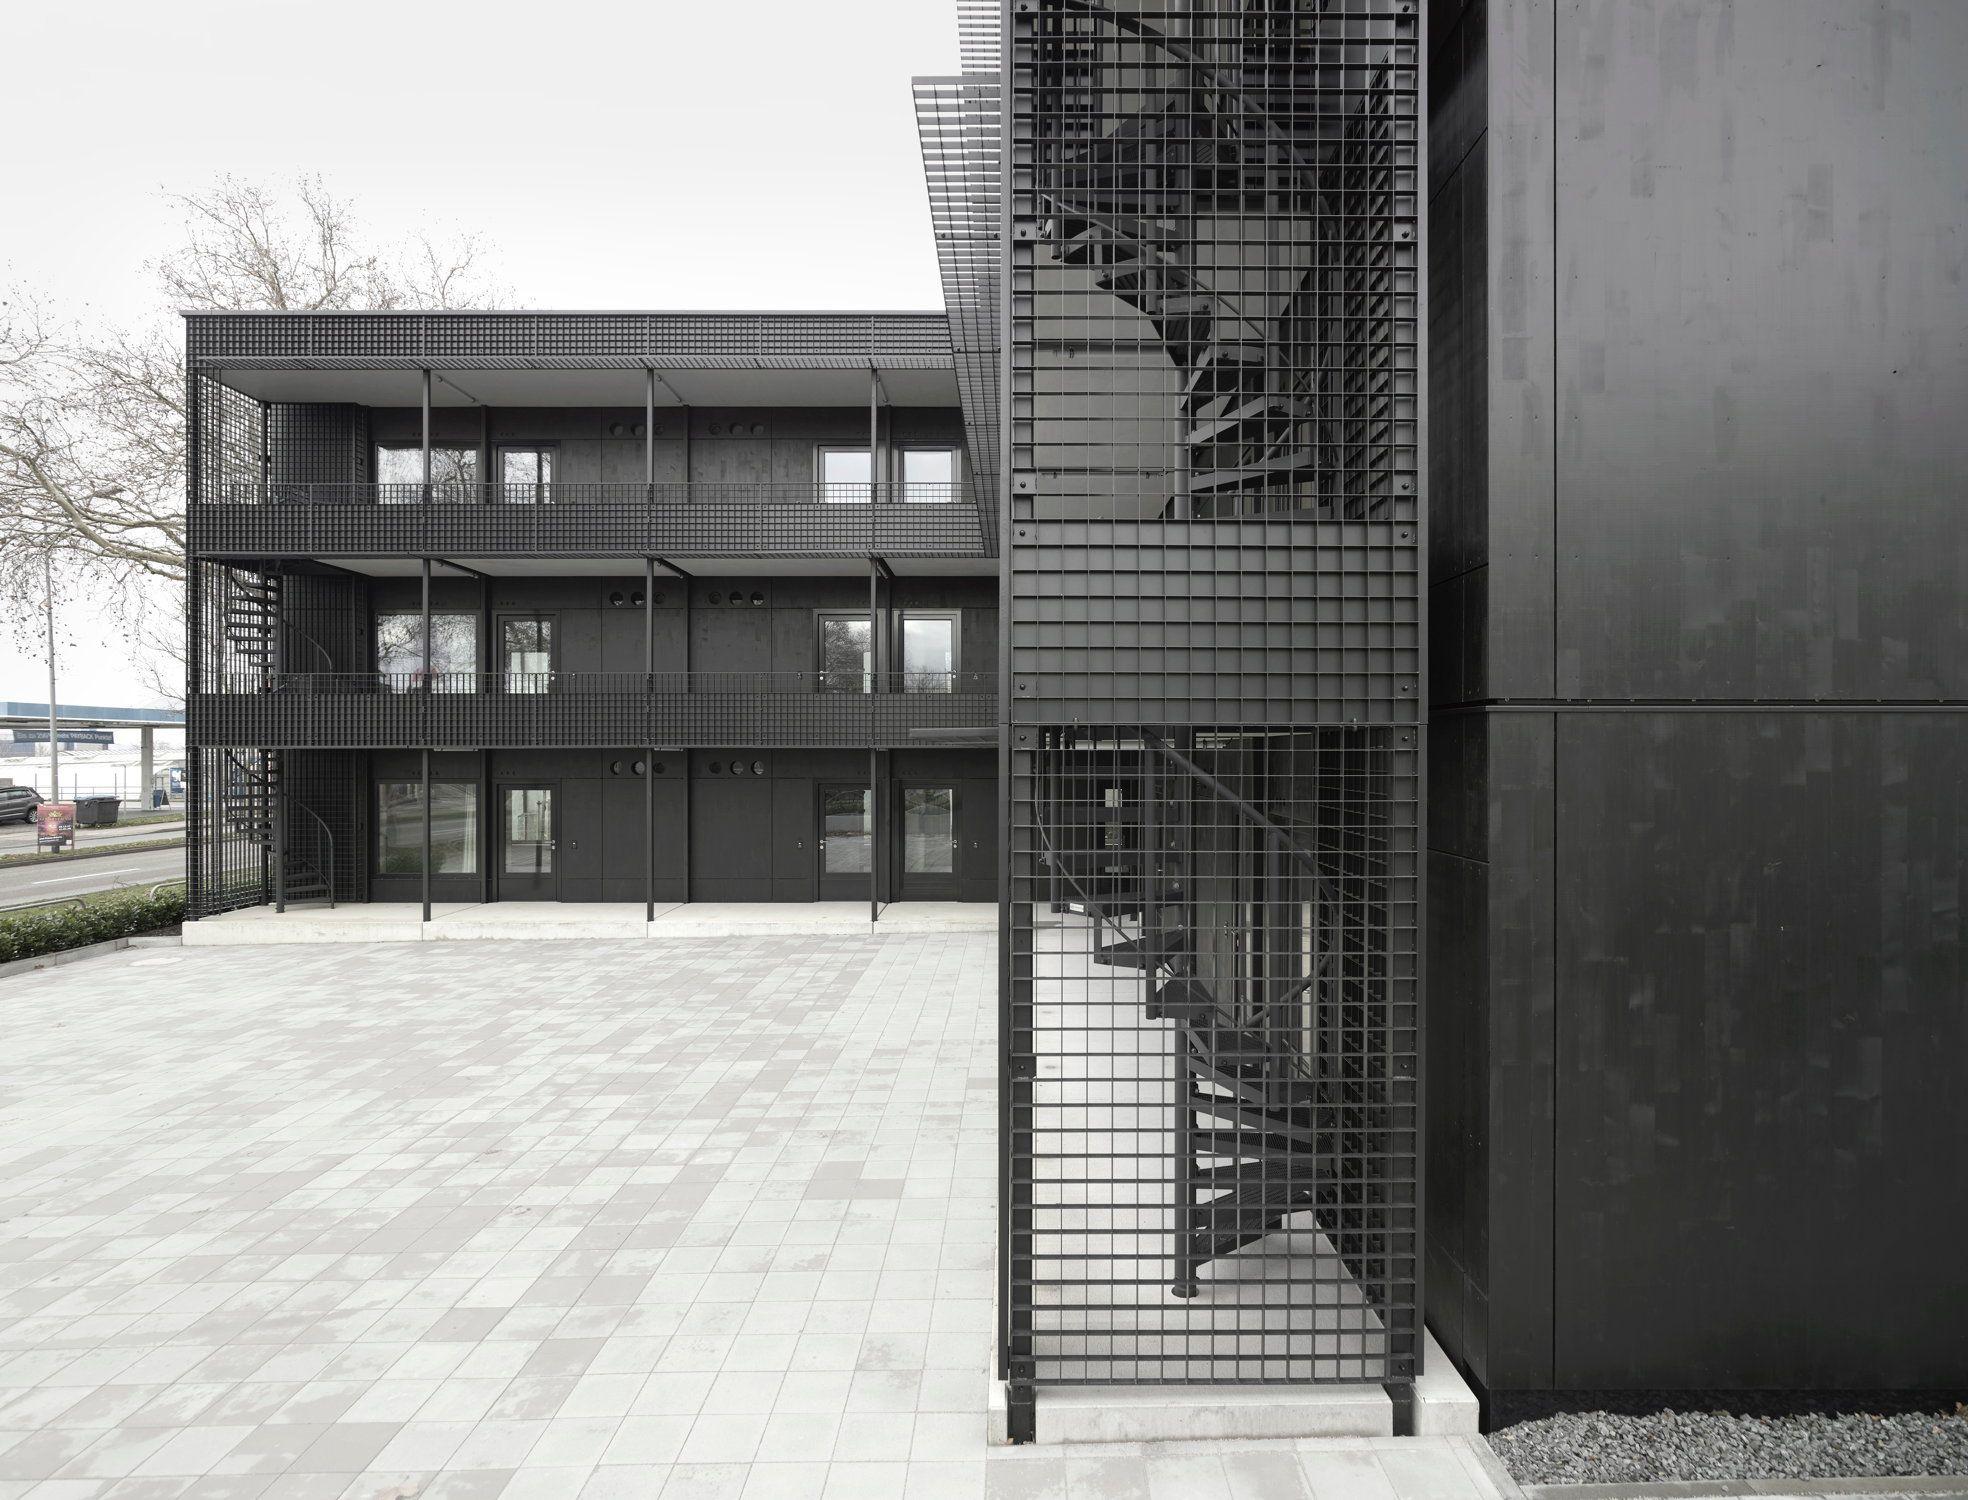 Architekten Heilbronn holzmodul für heilbronn mikro wohnungen joos keller heilbronn